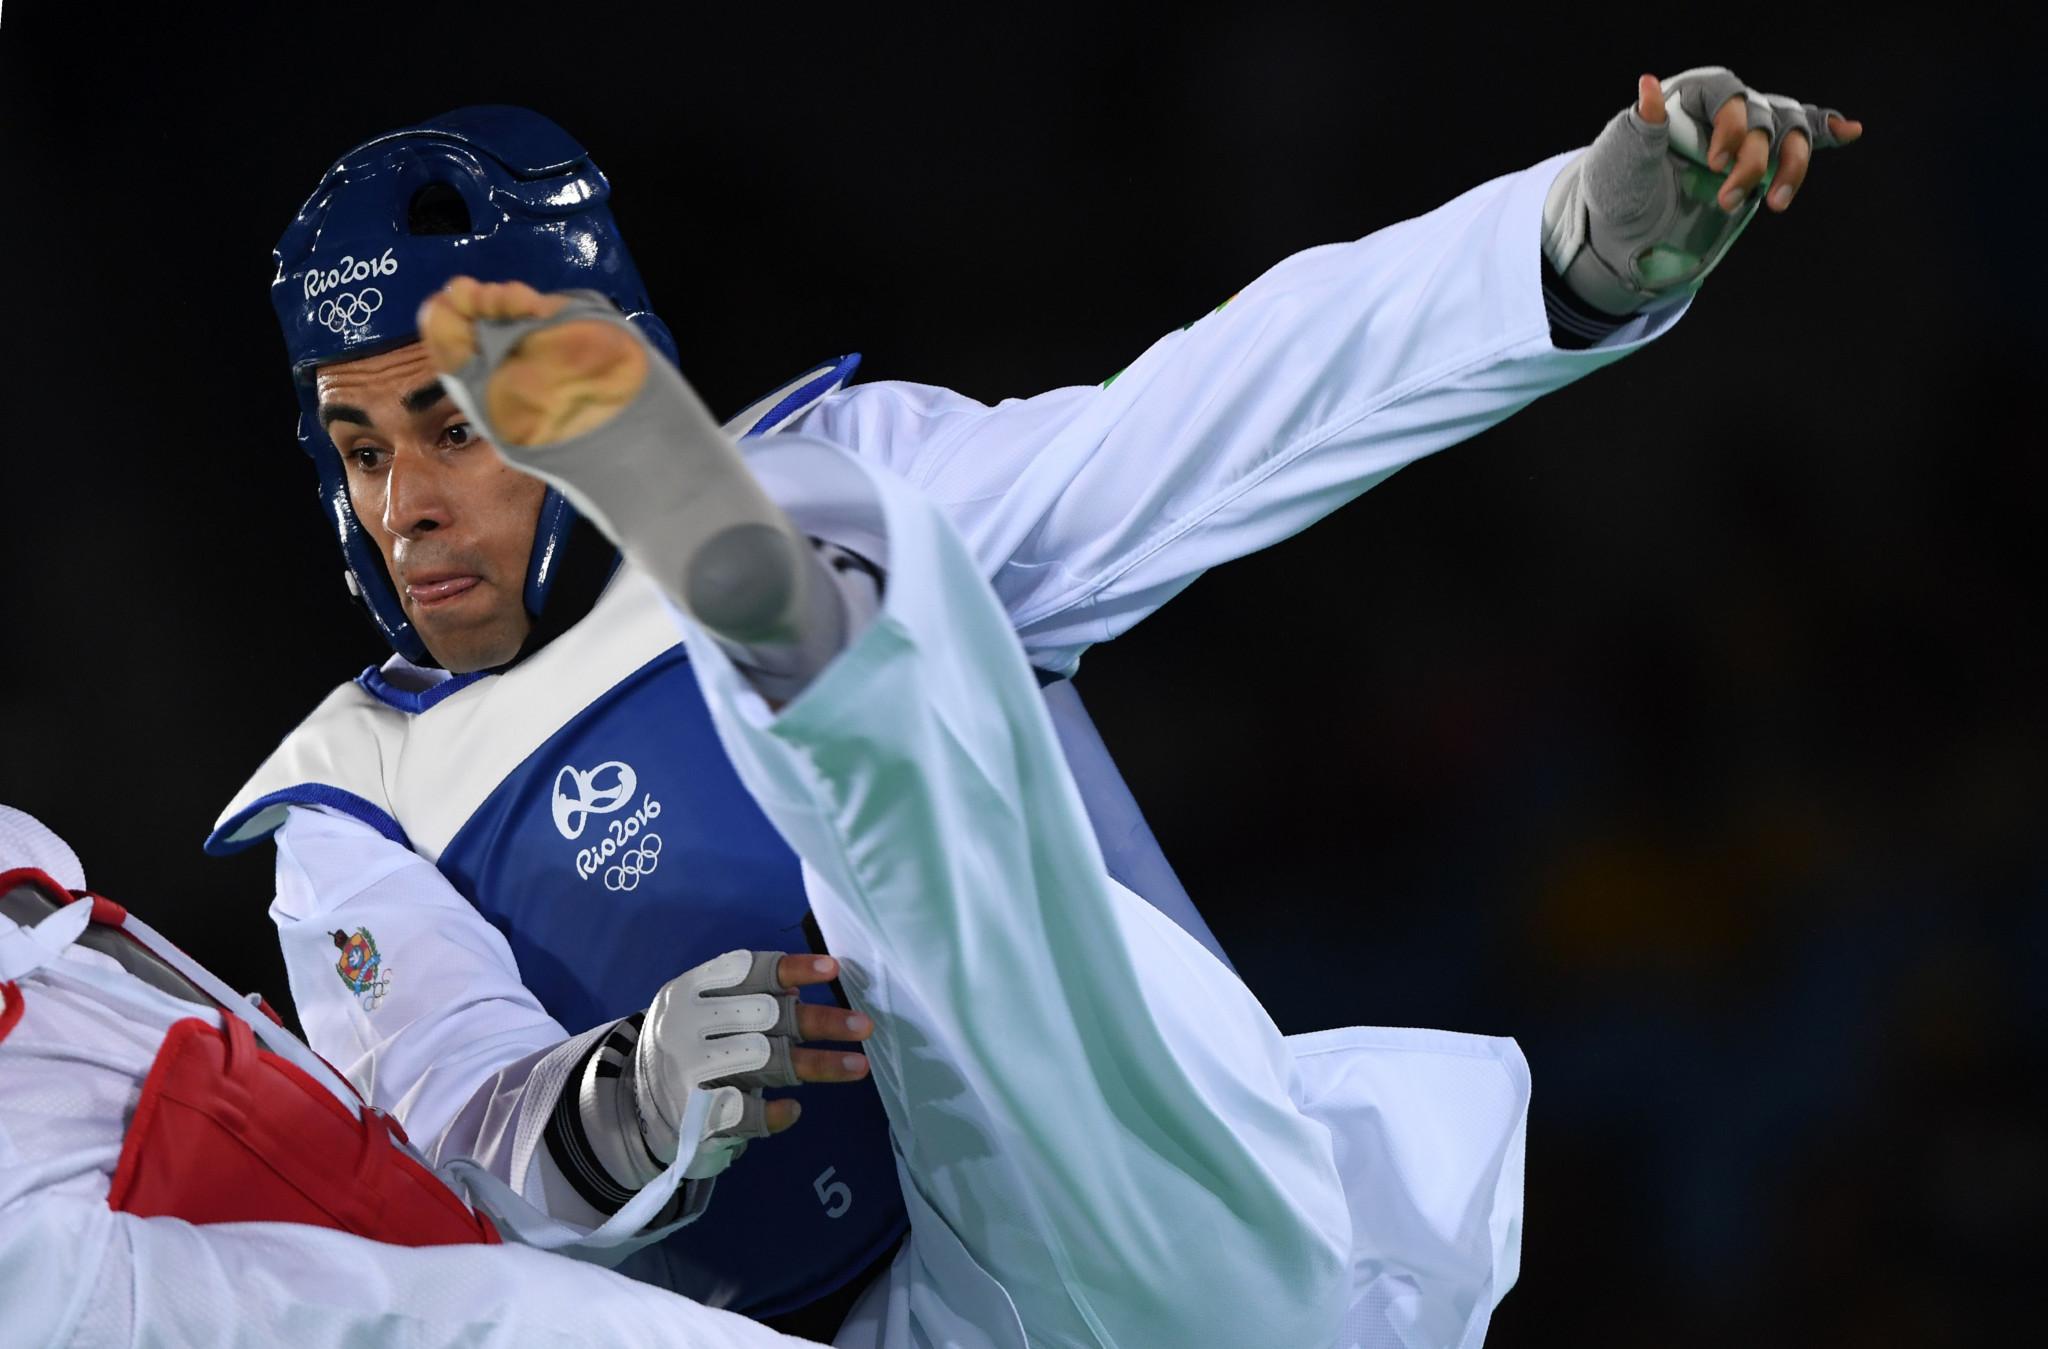 Taufatofua earns Tokyo 2020 berth at Oceania taekwondo qualifier in Gold Coast